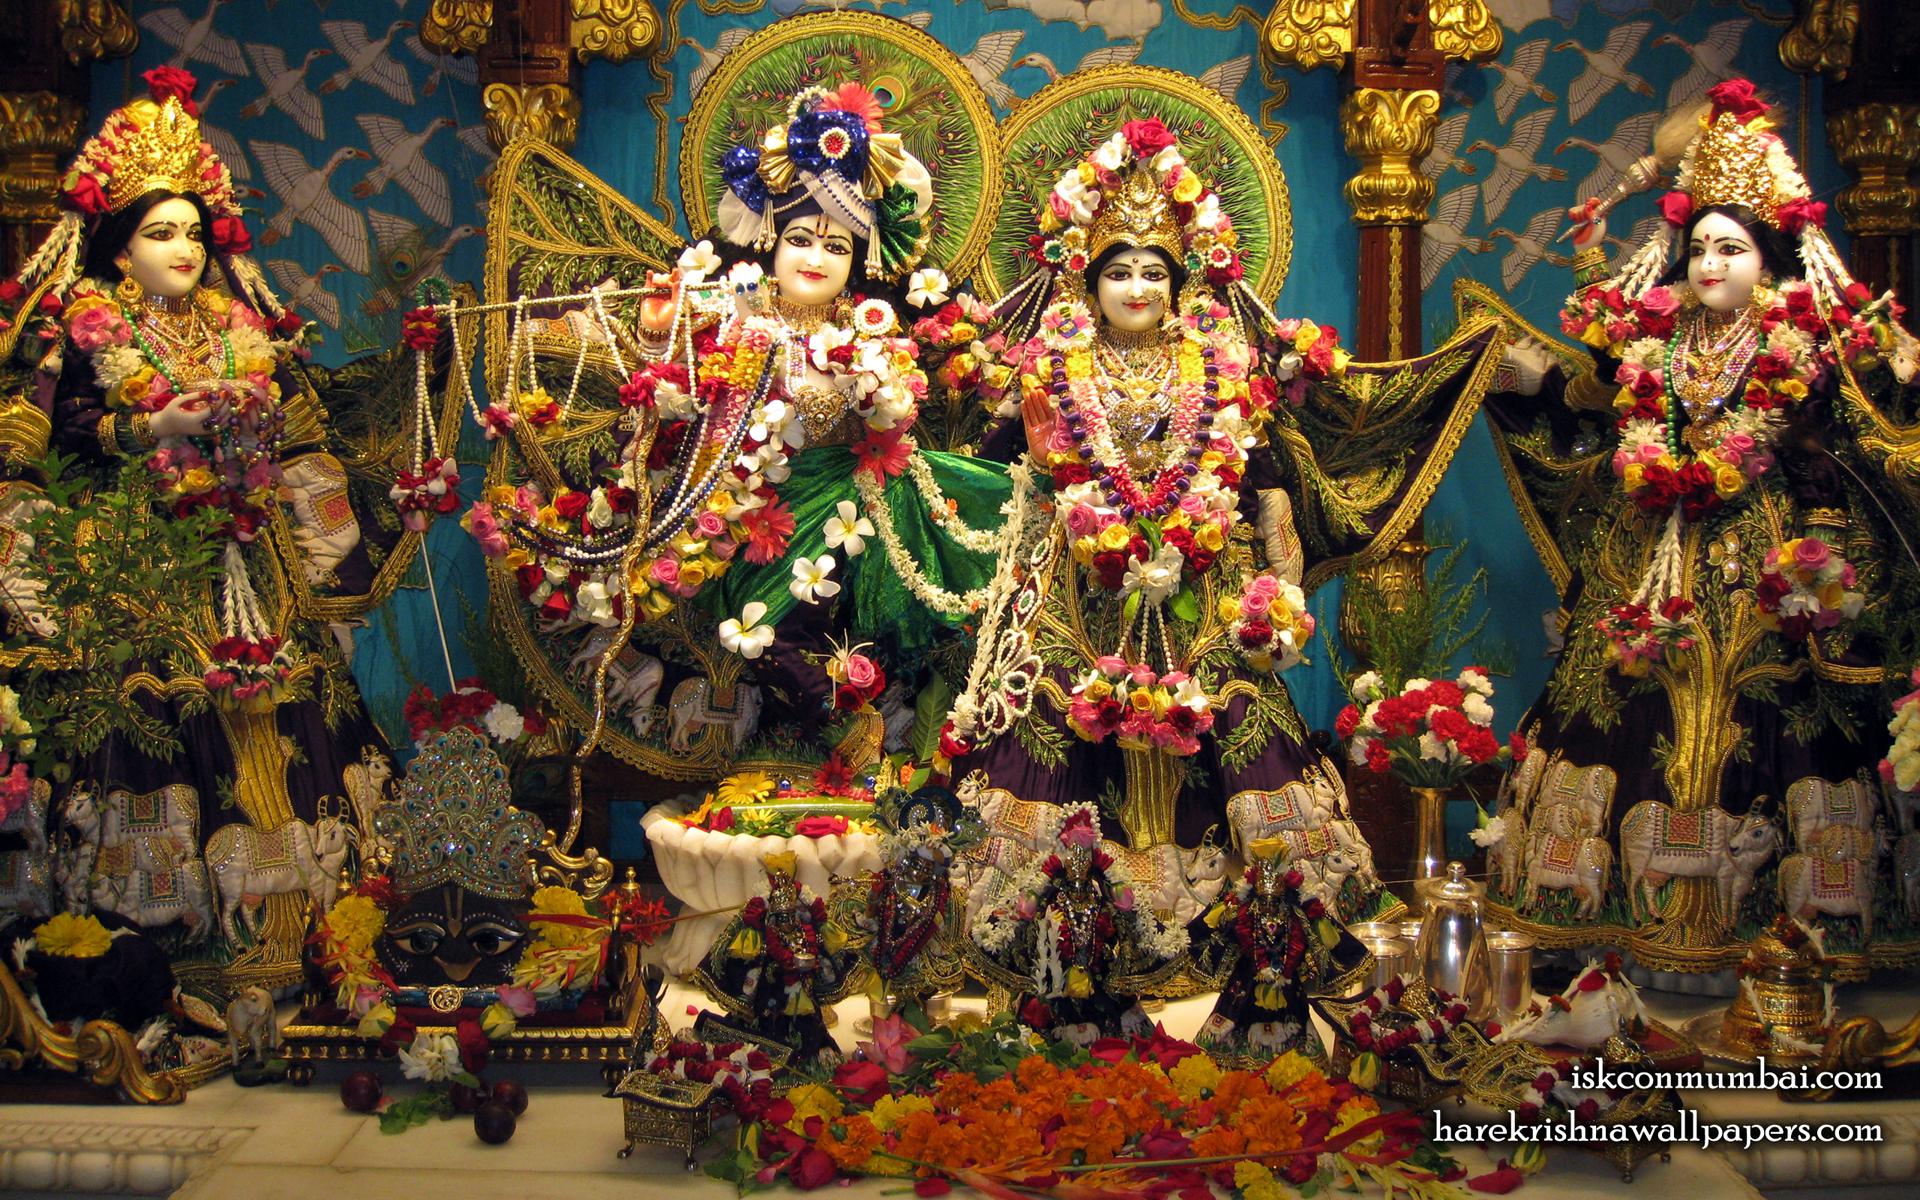 Sri Sri Radha Rasabihari Lalita Vishakha Wallpaper (002) Size 1920x1200 Download